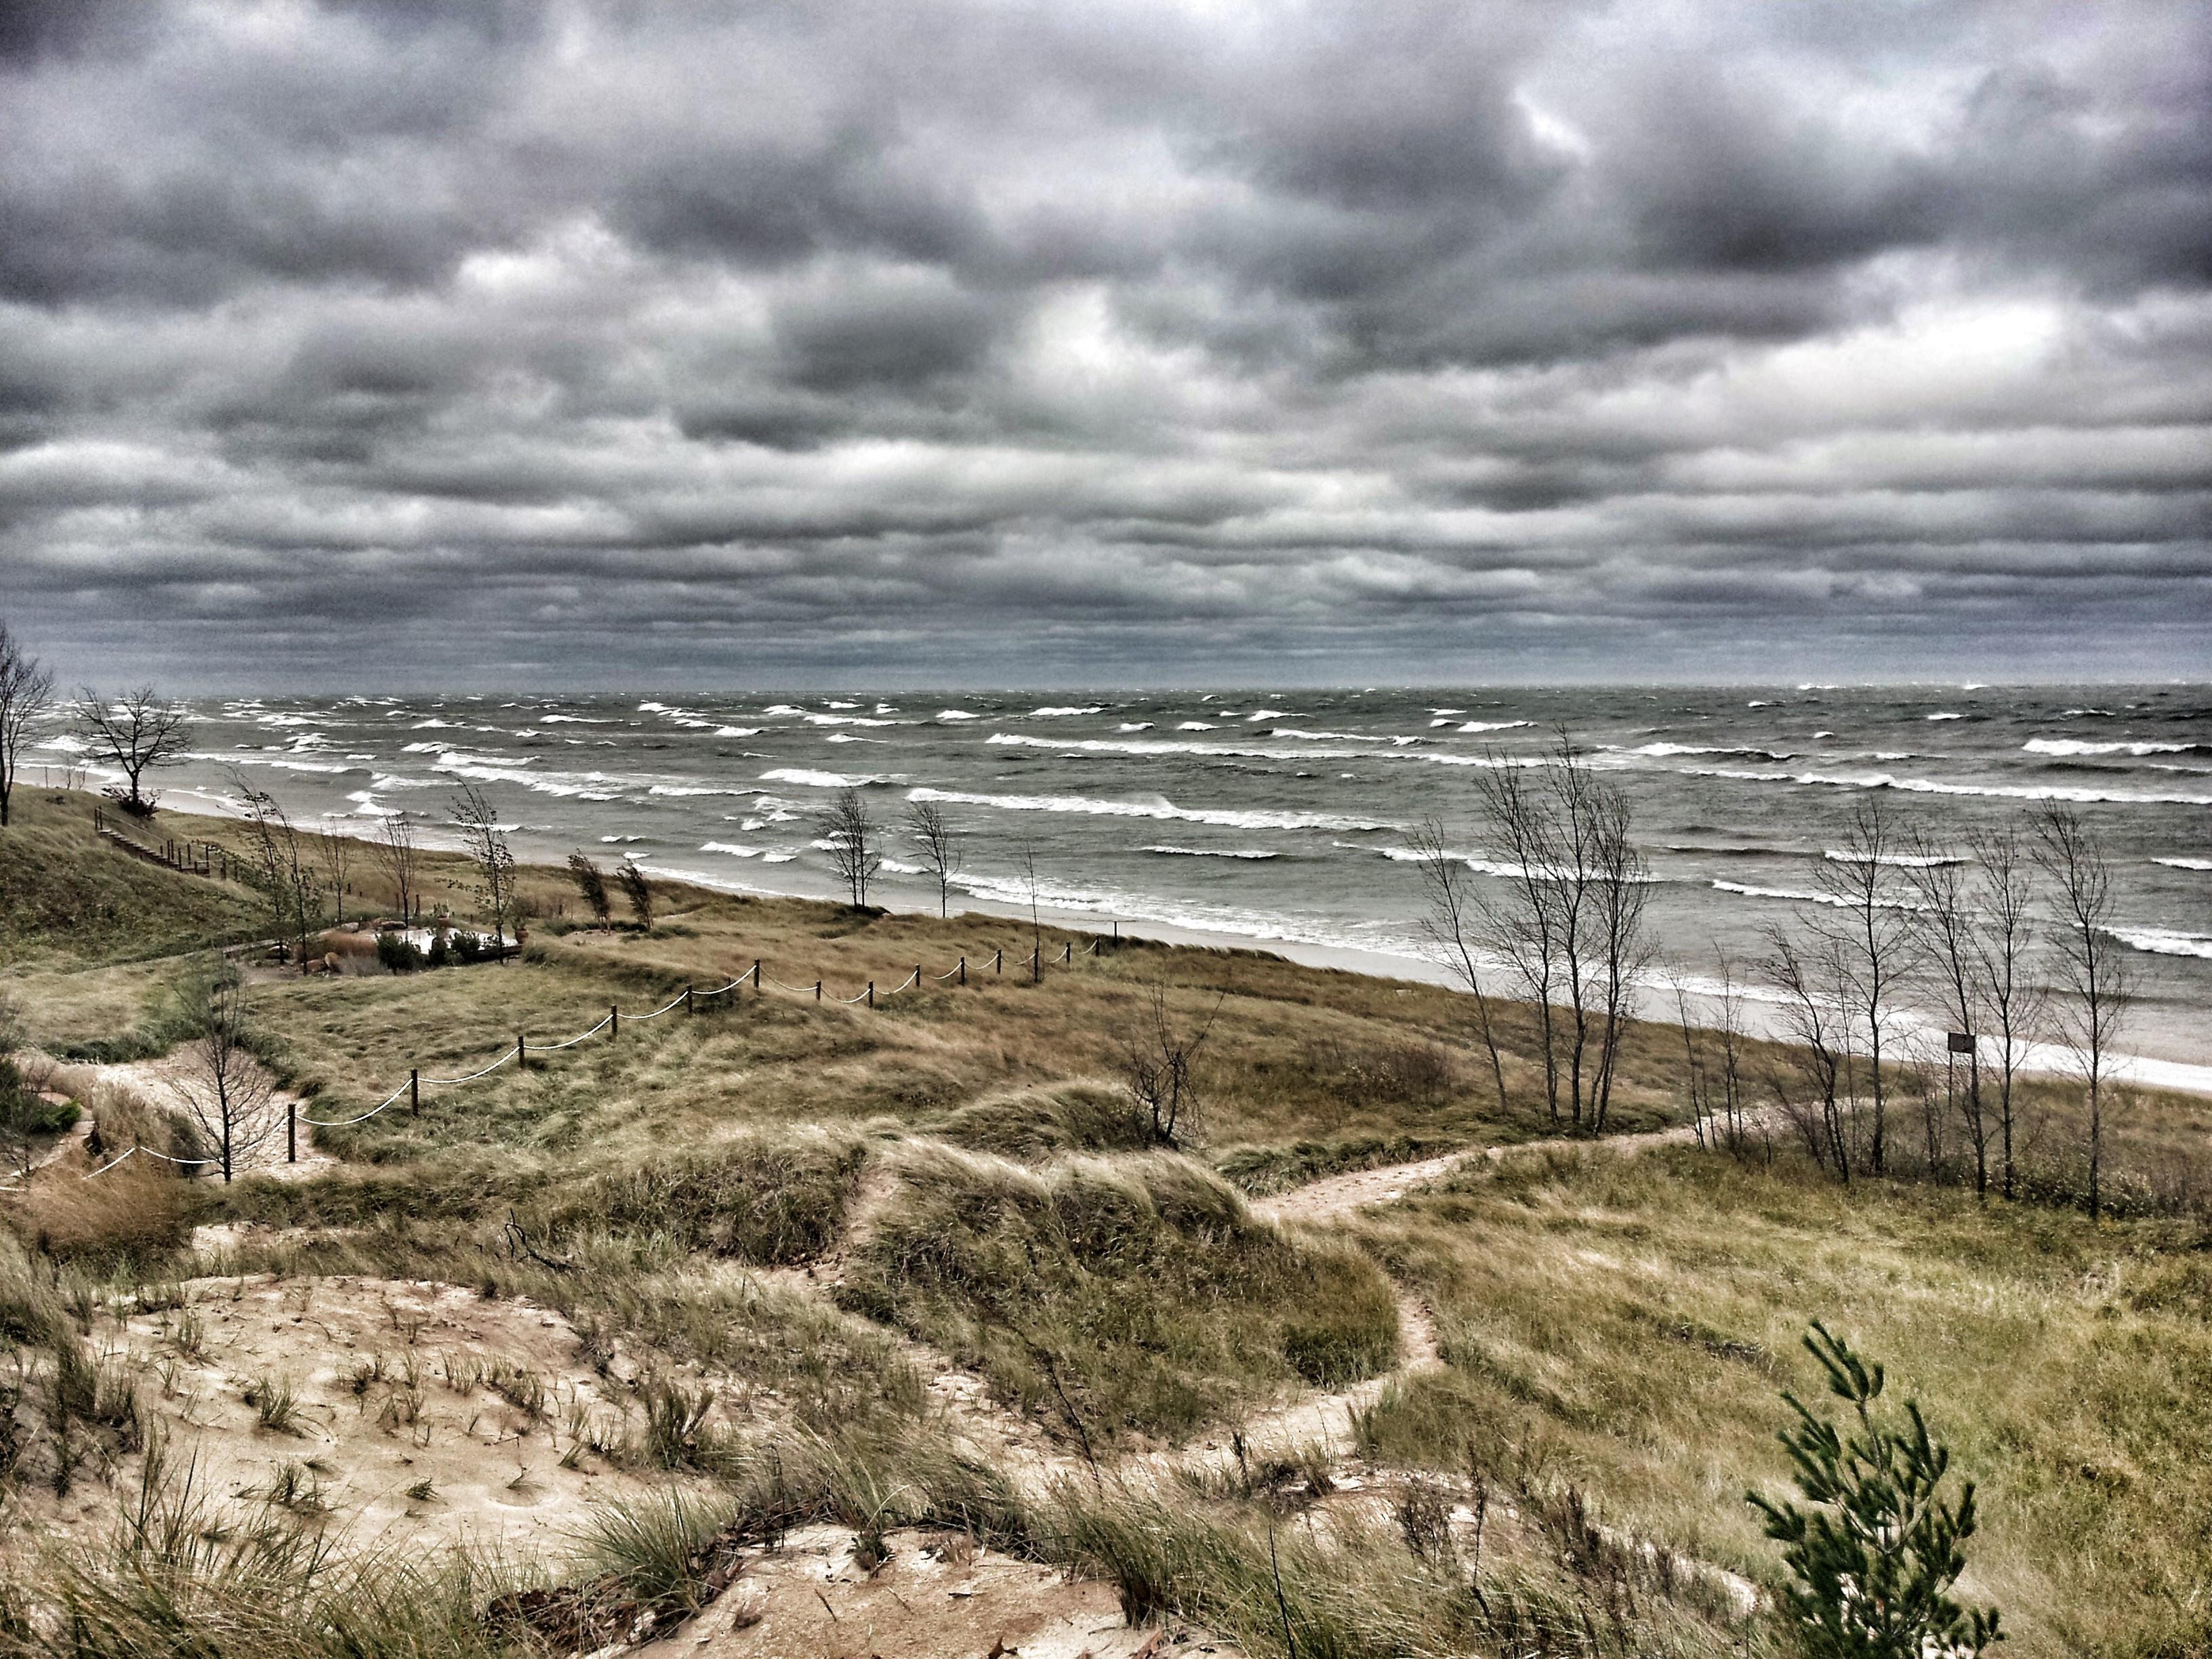 Thunderstorms on Lake Michigan in Southwest Michigan